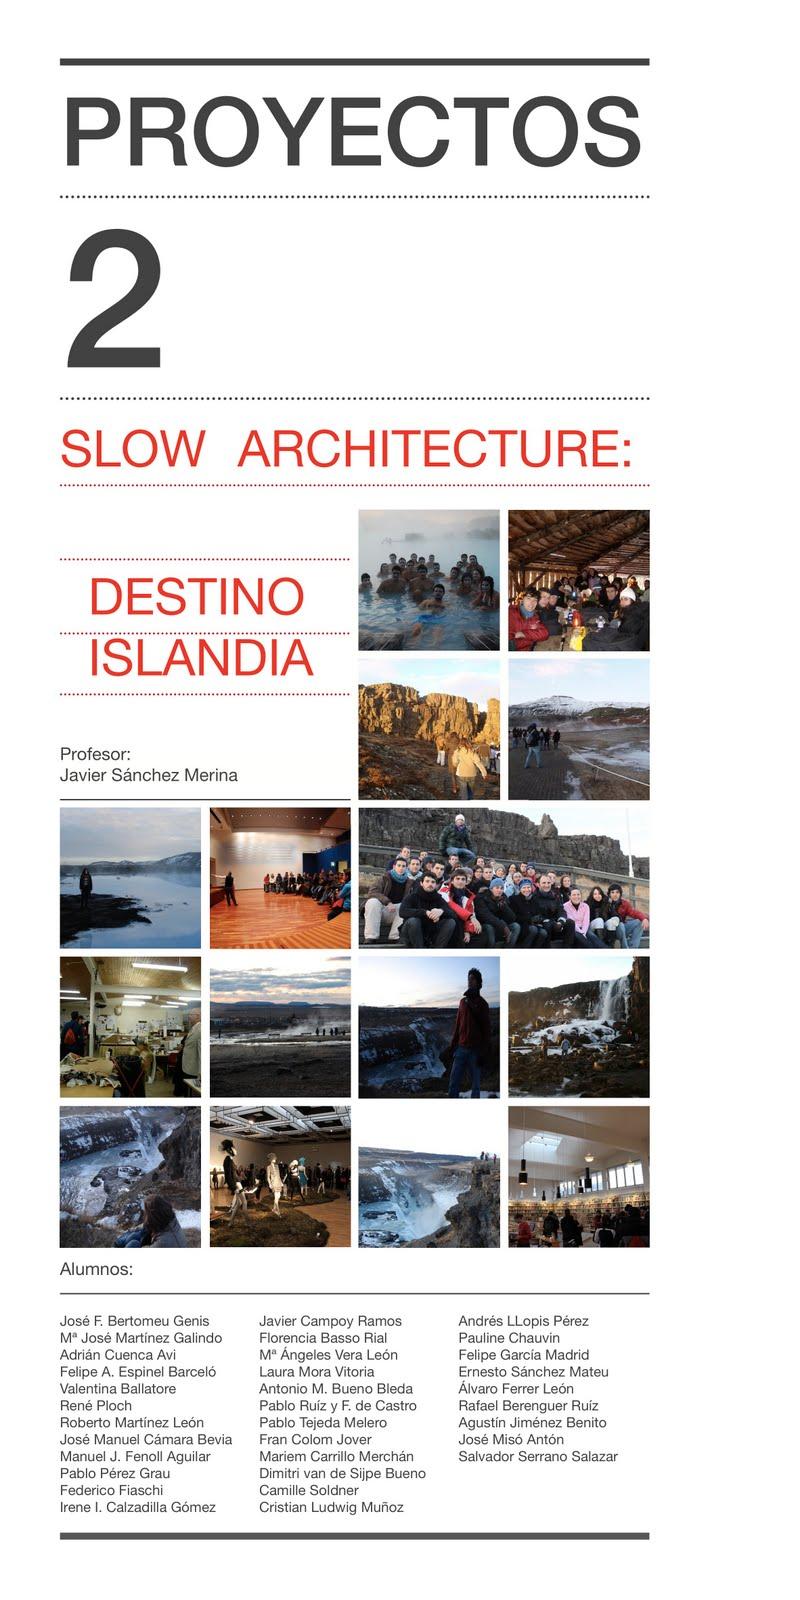 DESTINO ISLANDIA / Arquitectura y Paisaje